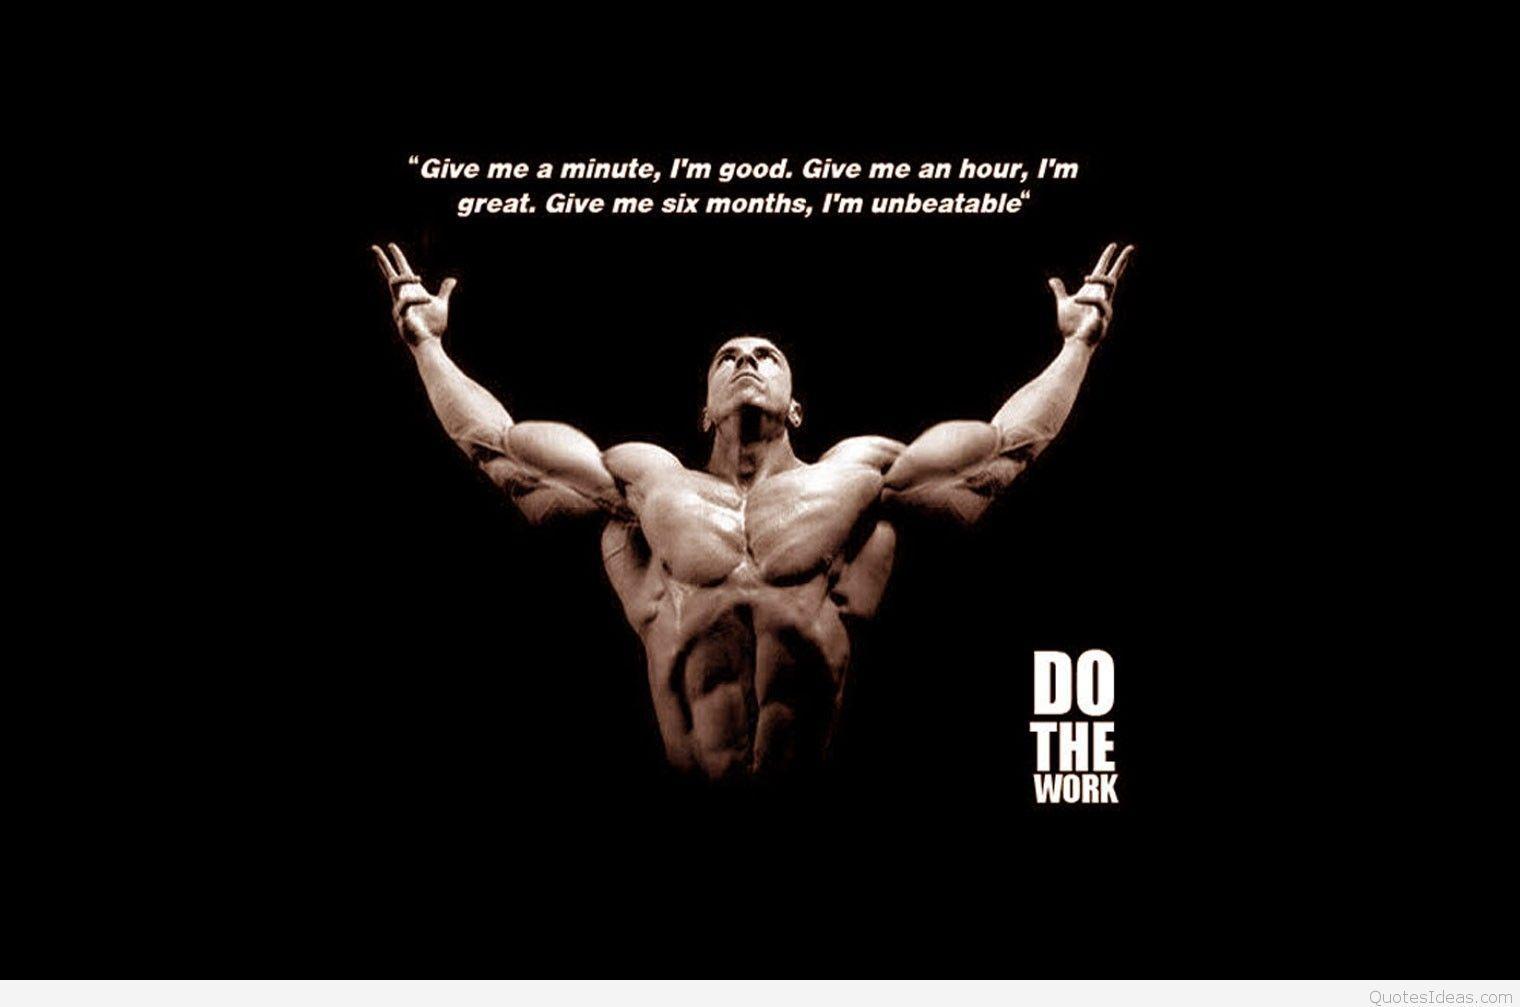 Bon Fitness HD Wallpaper Mobile Quote